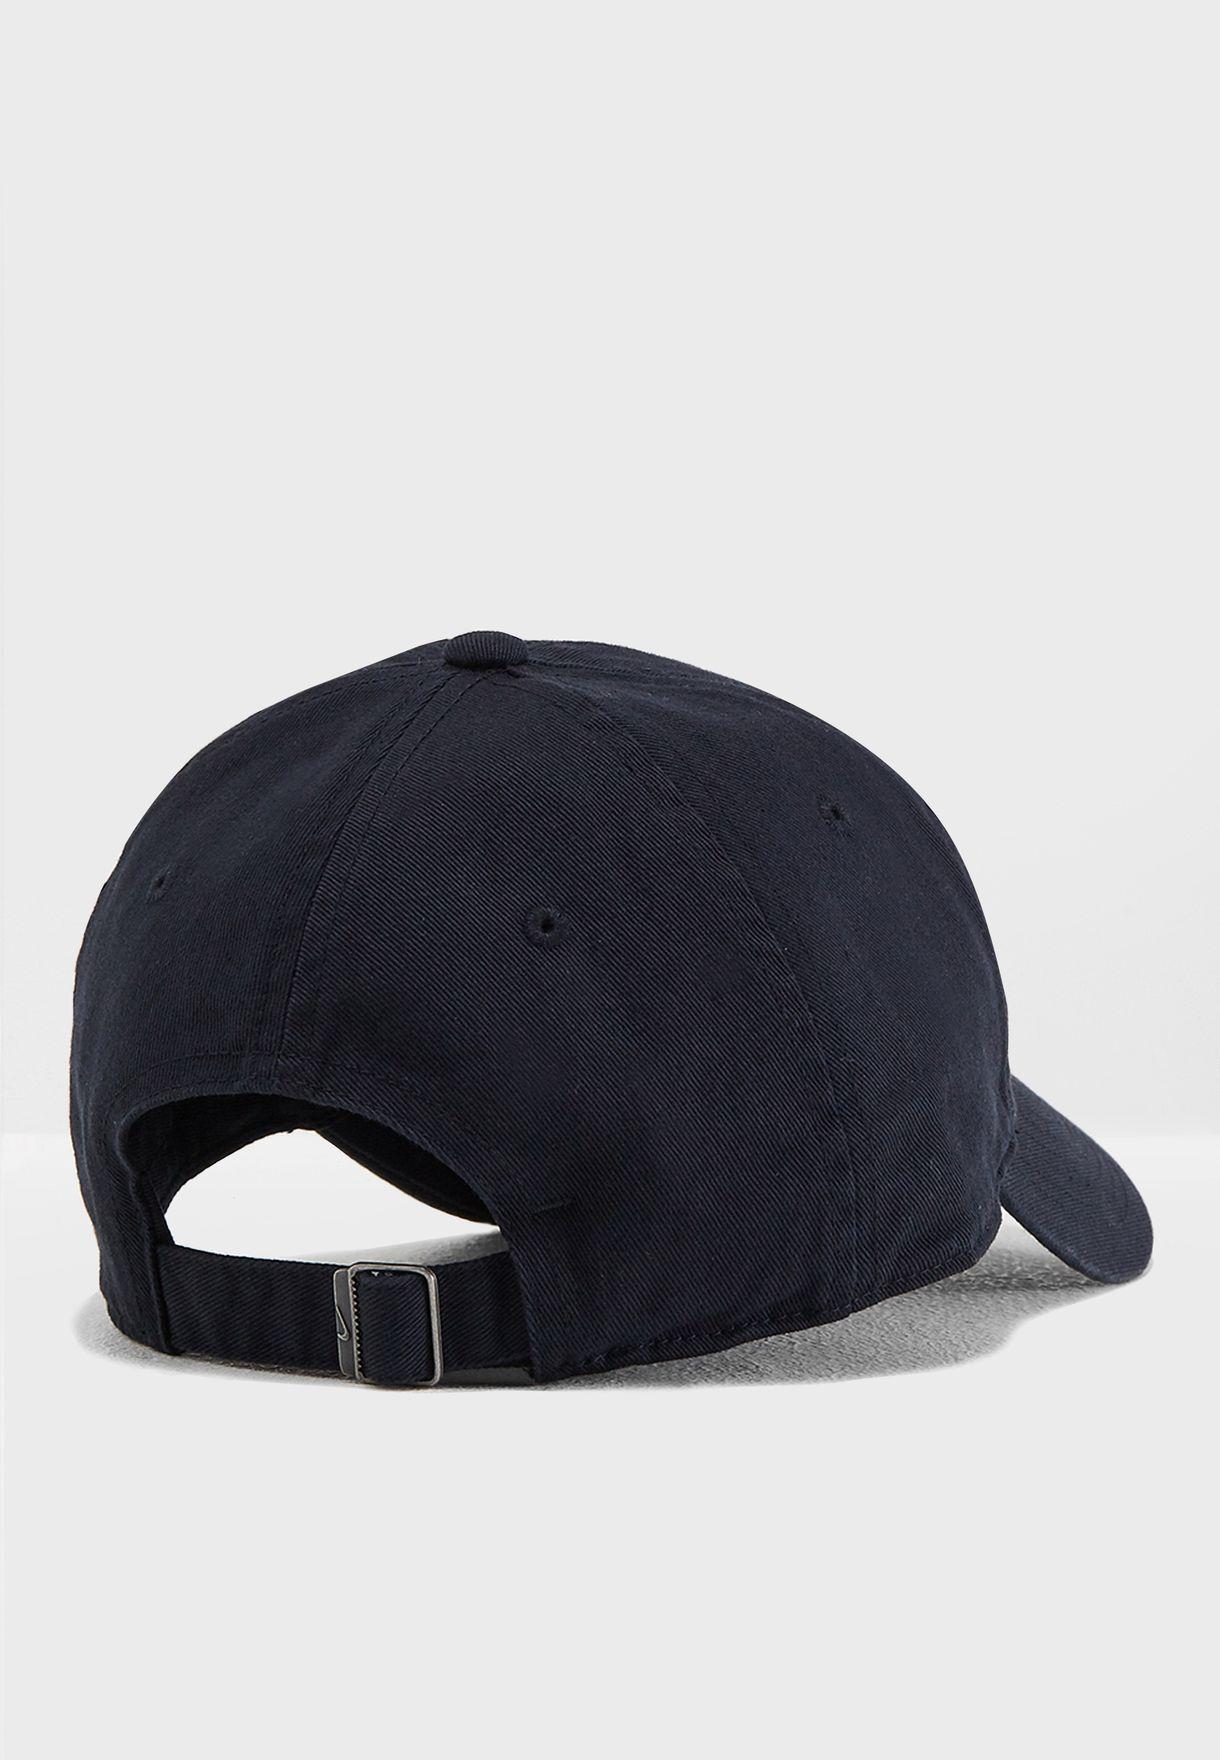 H86 Futura Classic Cap